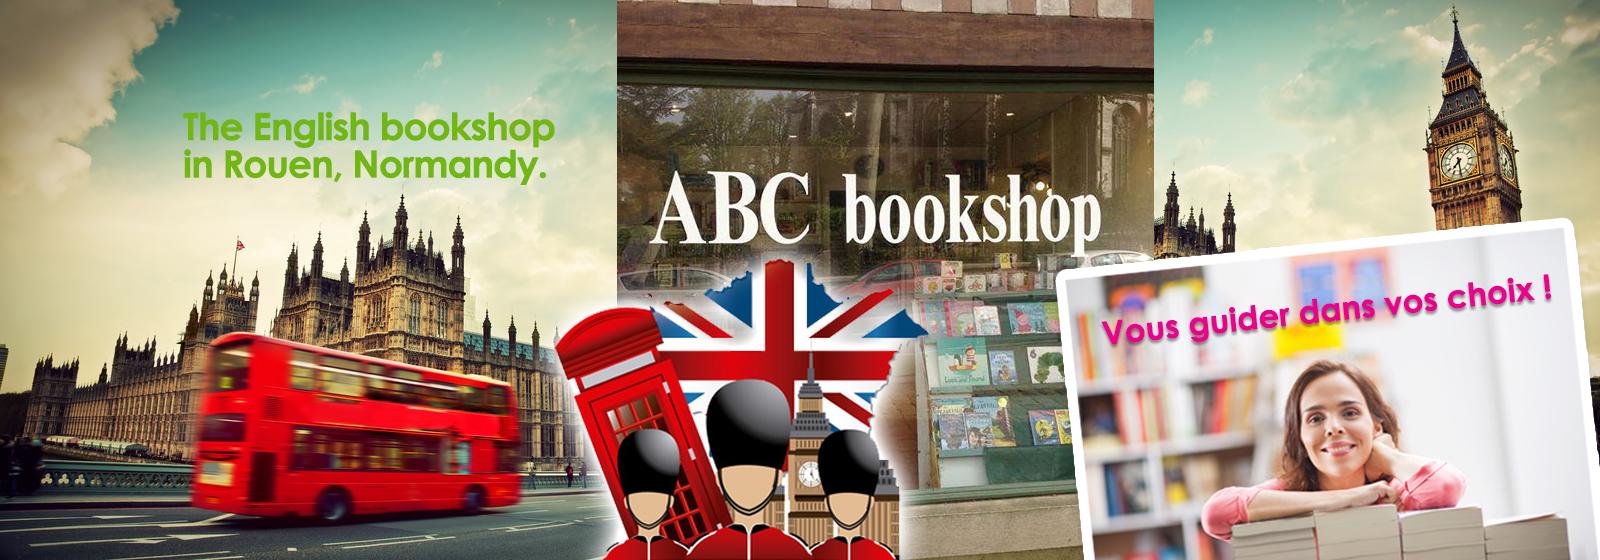 Abc bookshop librairie anglaise rouen for Abc espace vert